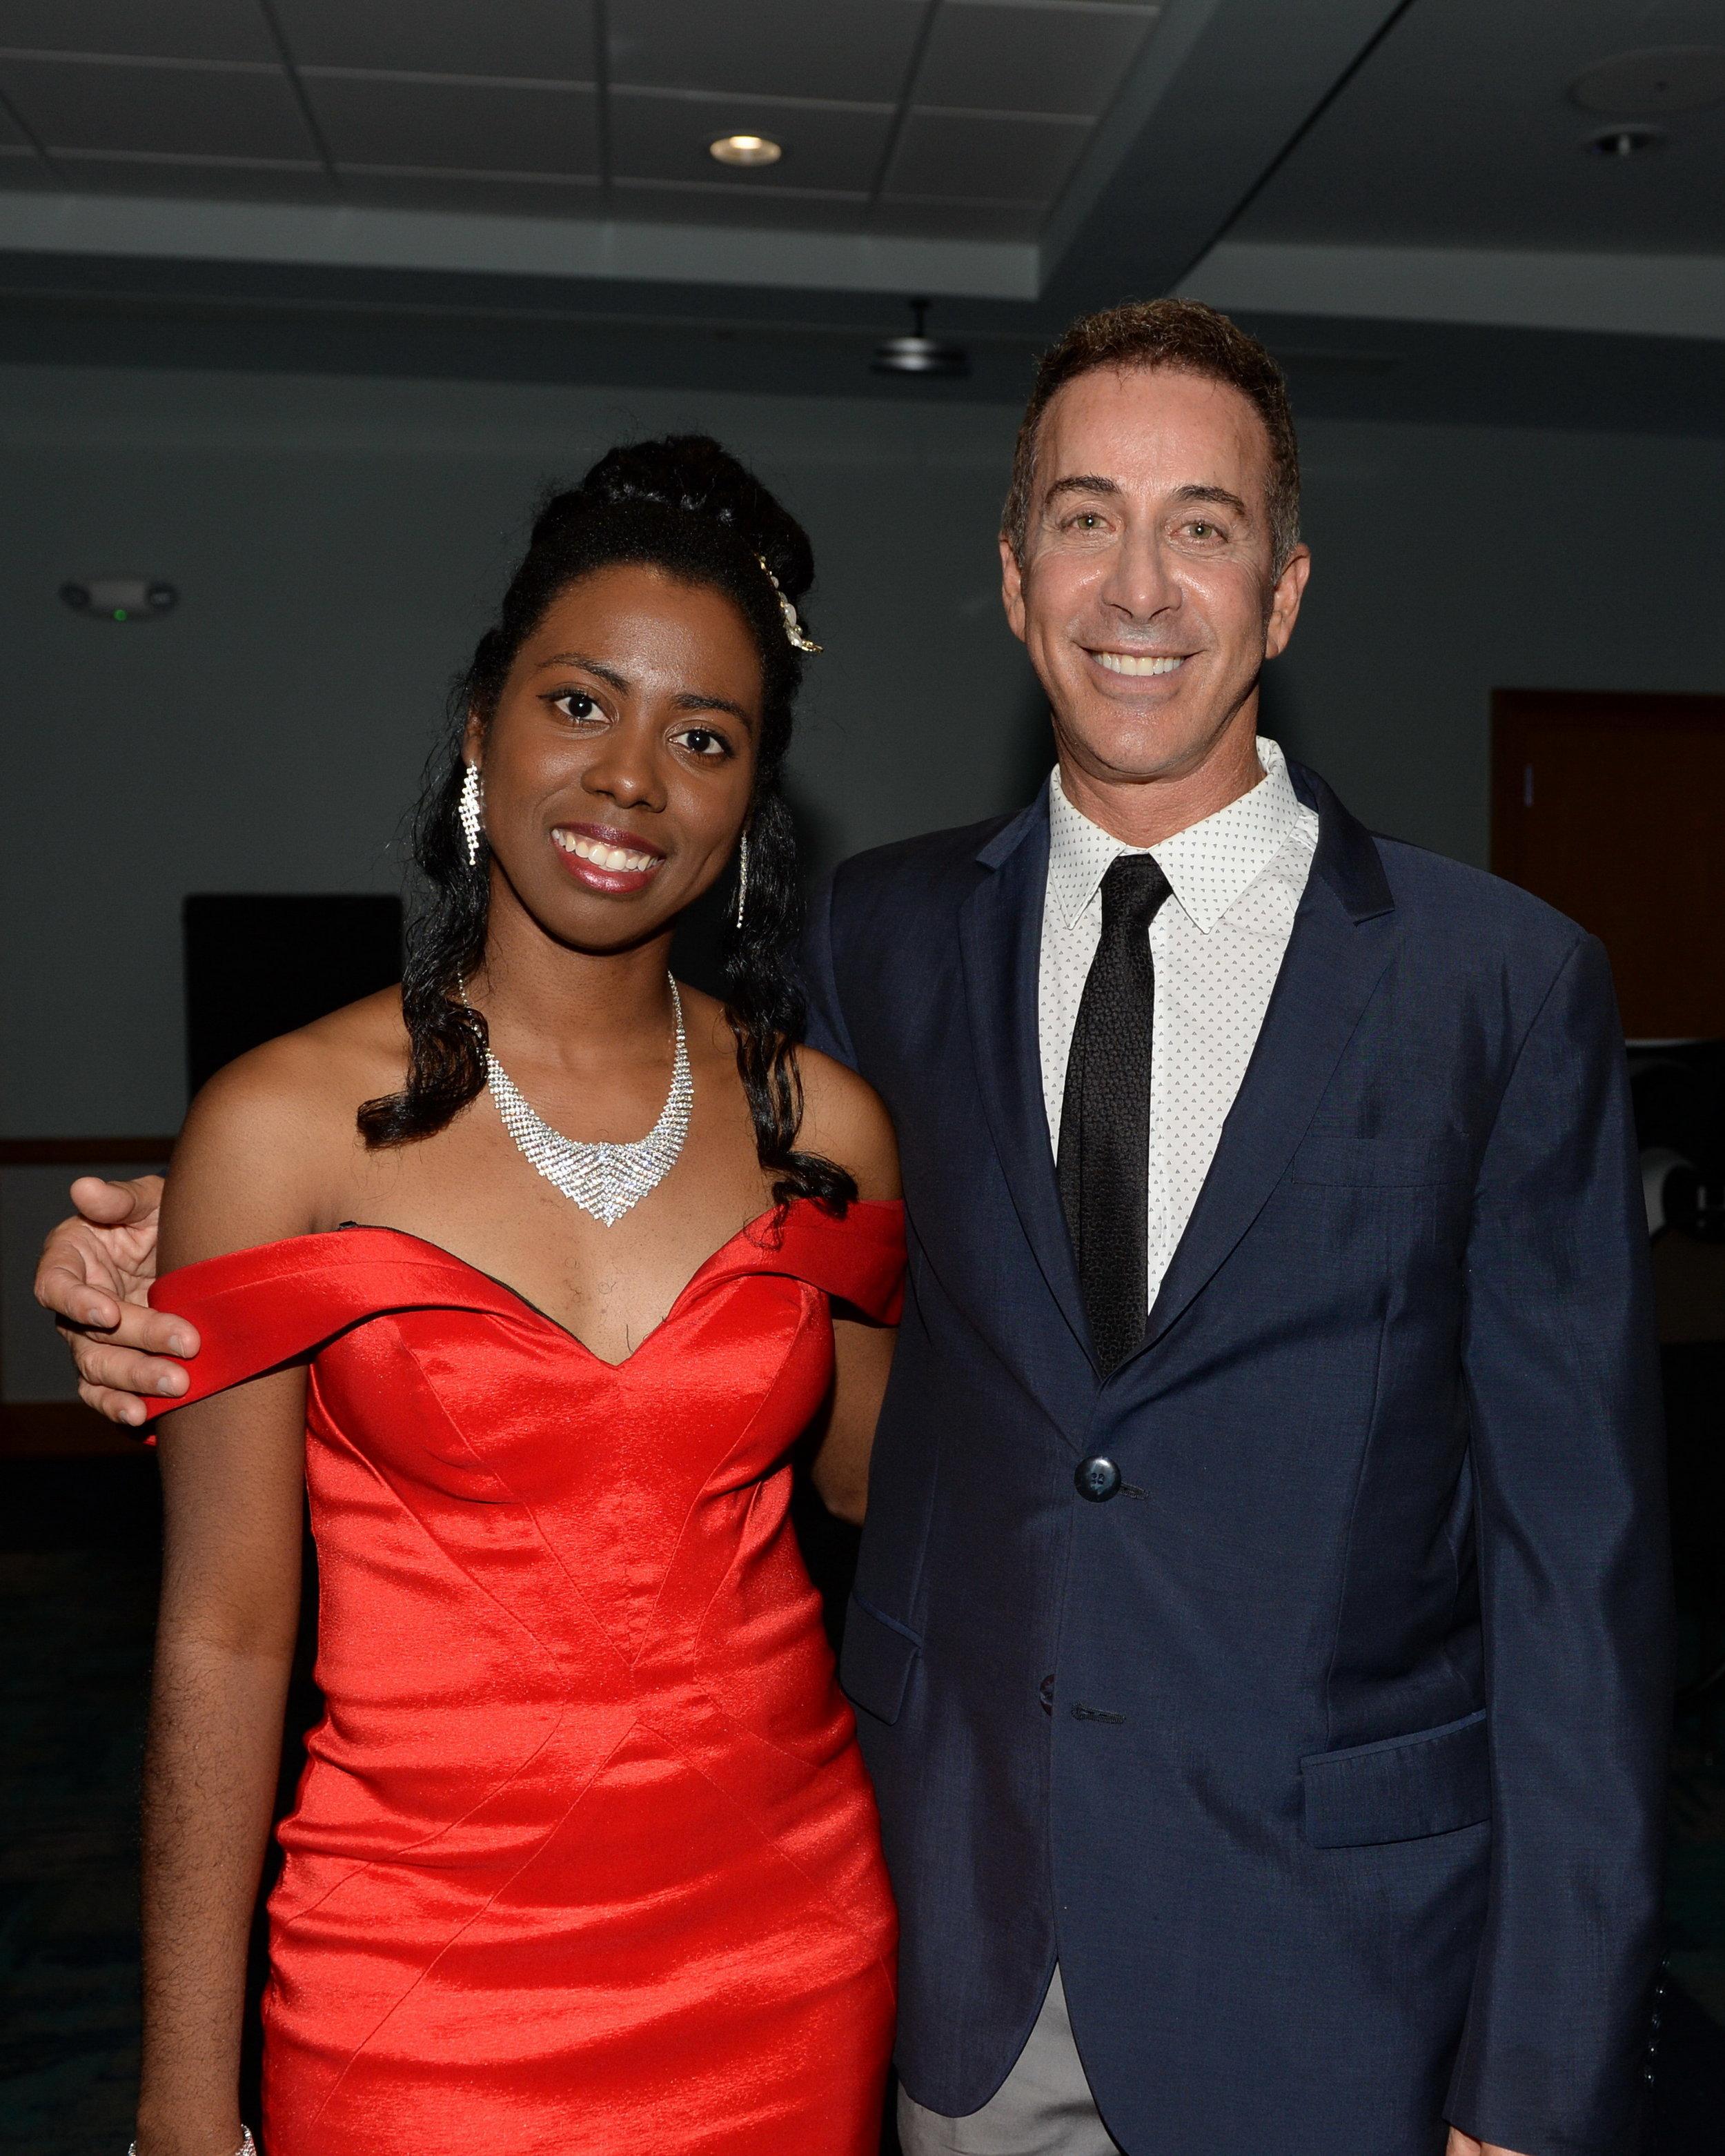 Kyaunnee Richardson and Robert Dover. DDeRosa photo.